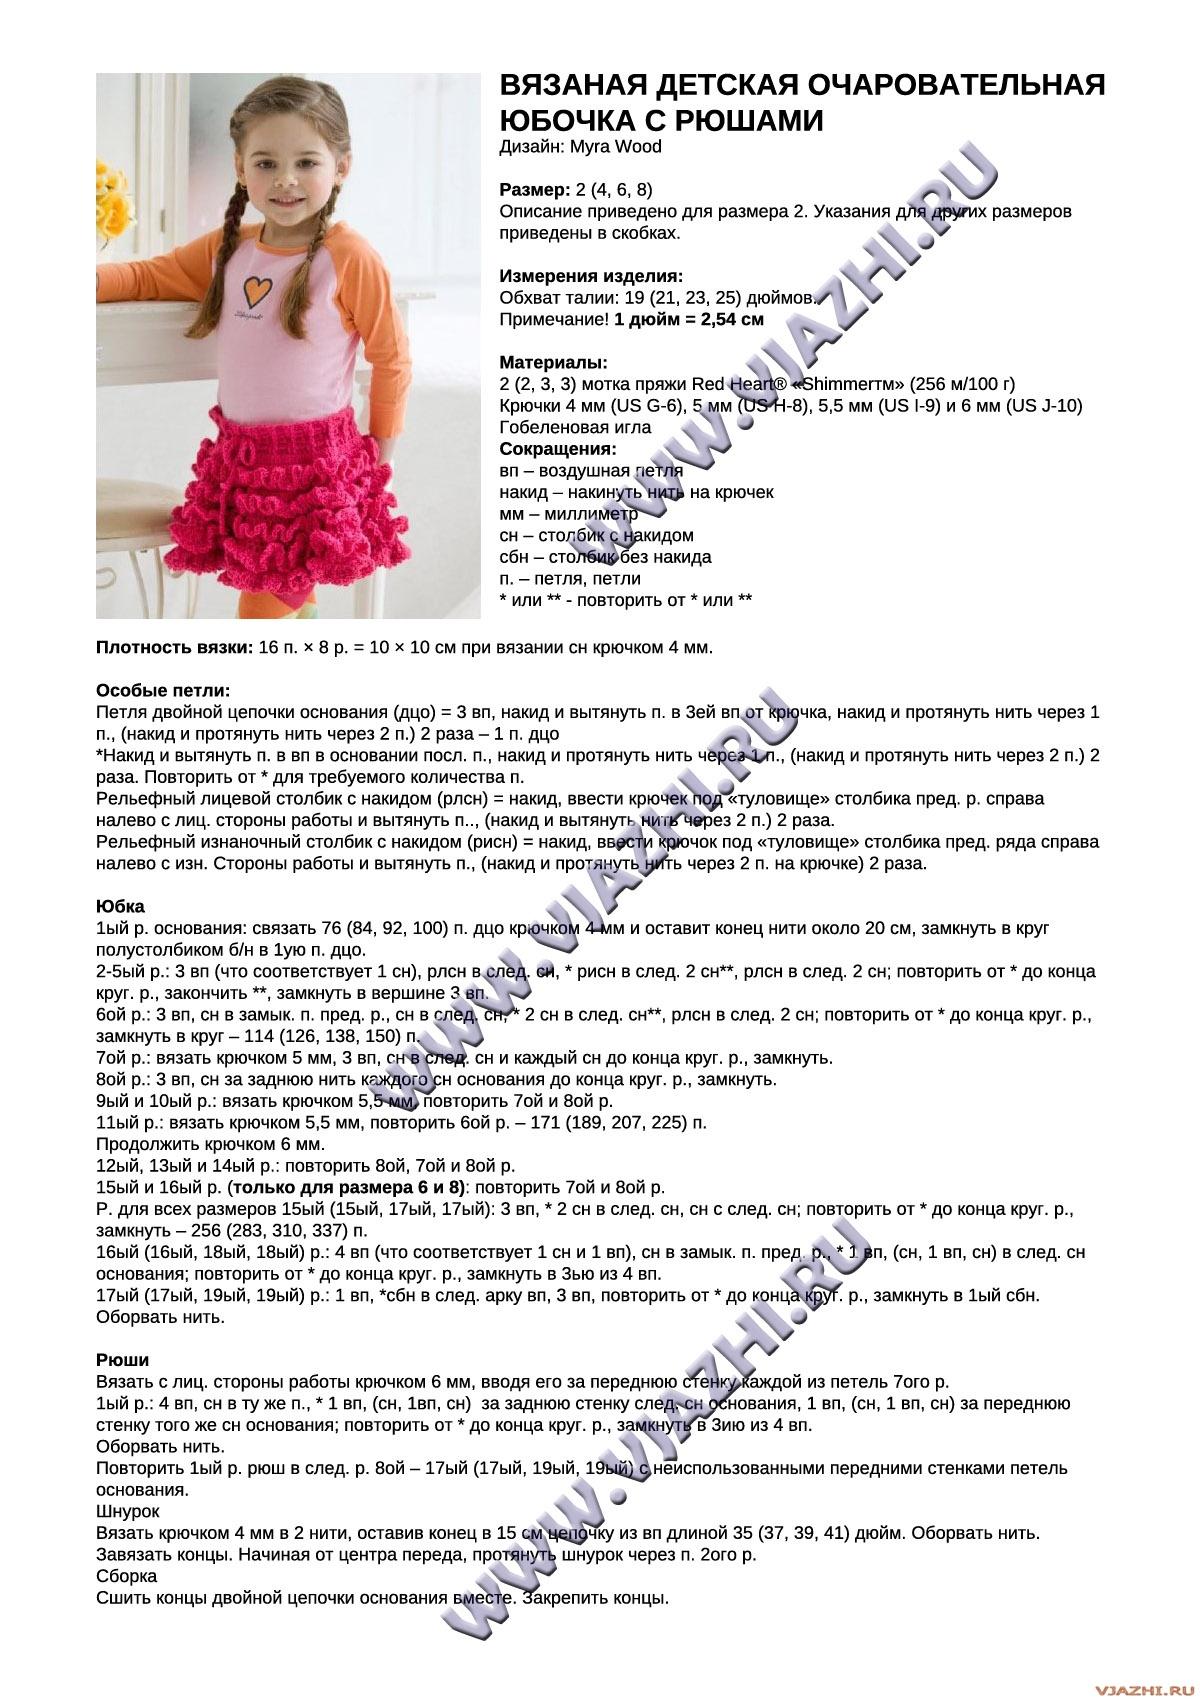 Теги: юбочка юбка юбка для девочки юбка крючком .  Схема вязания волана.